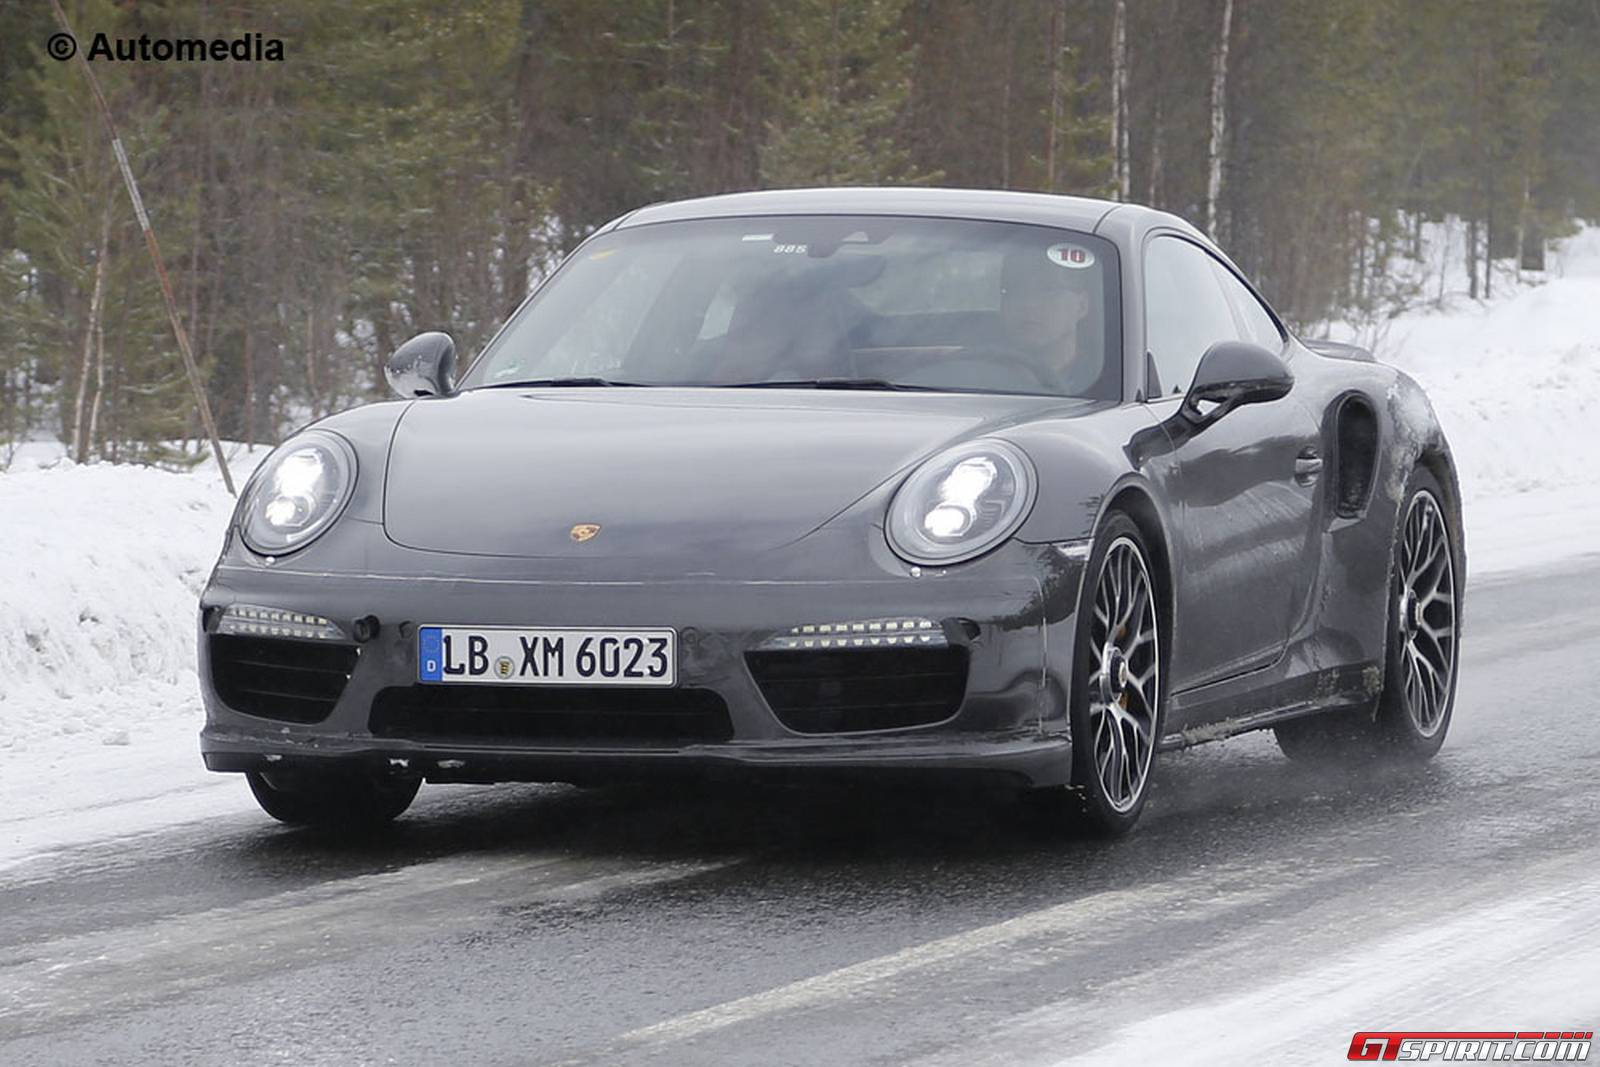 Fresh Porsche 911 Turbo S Facelift Spy Shots Reveal Updated Interior Gtspirit